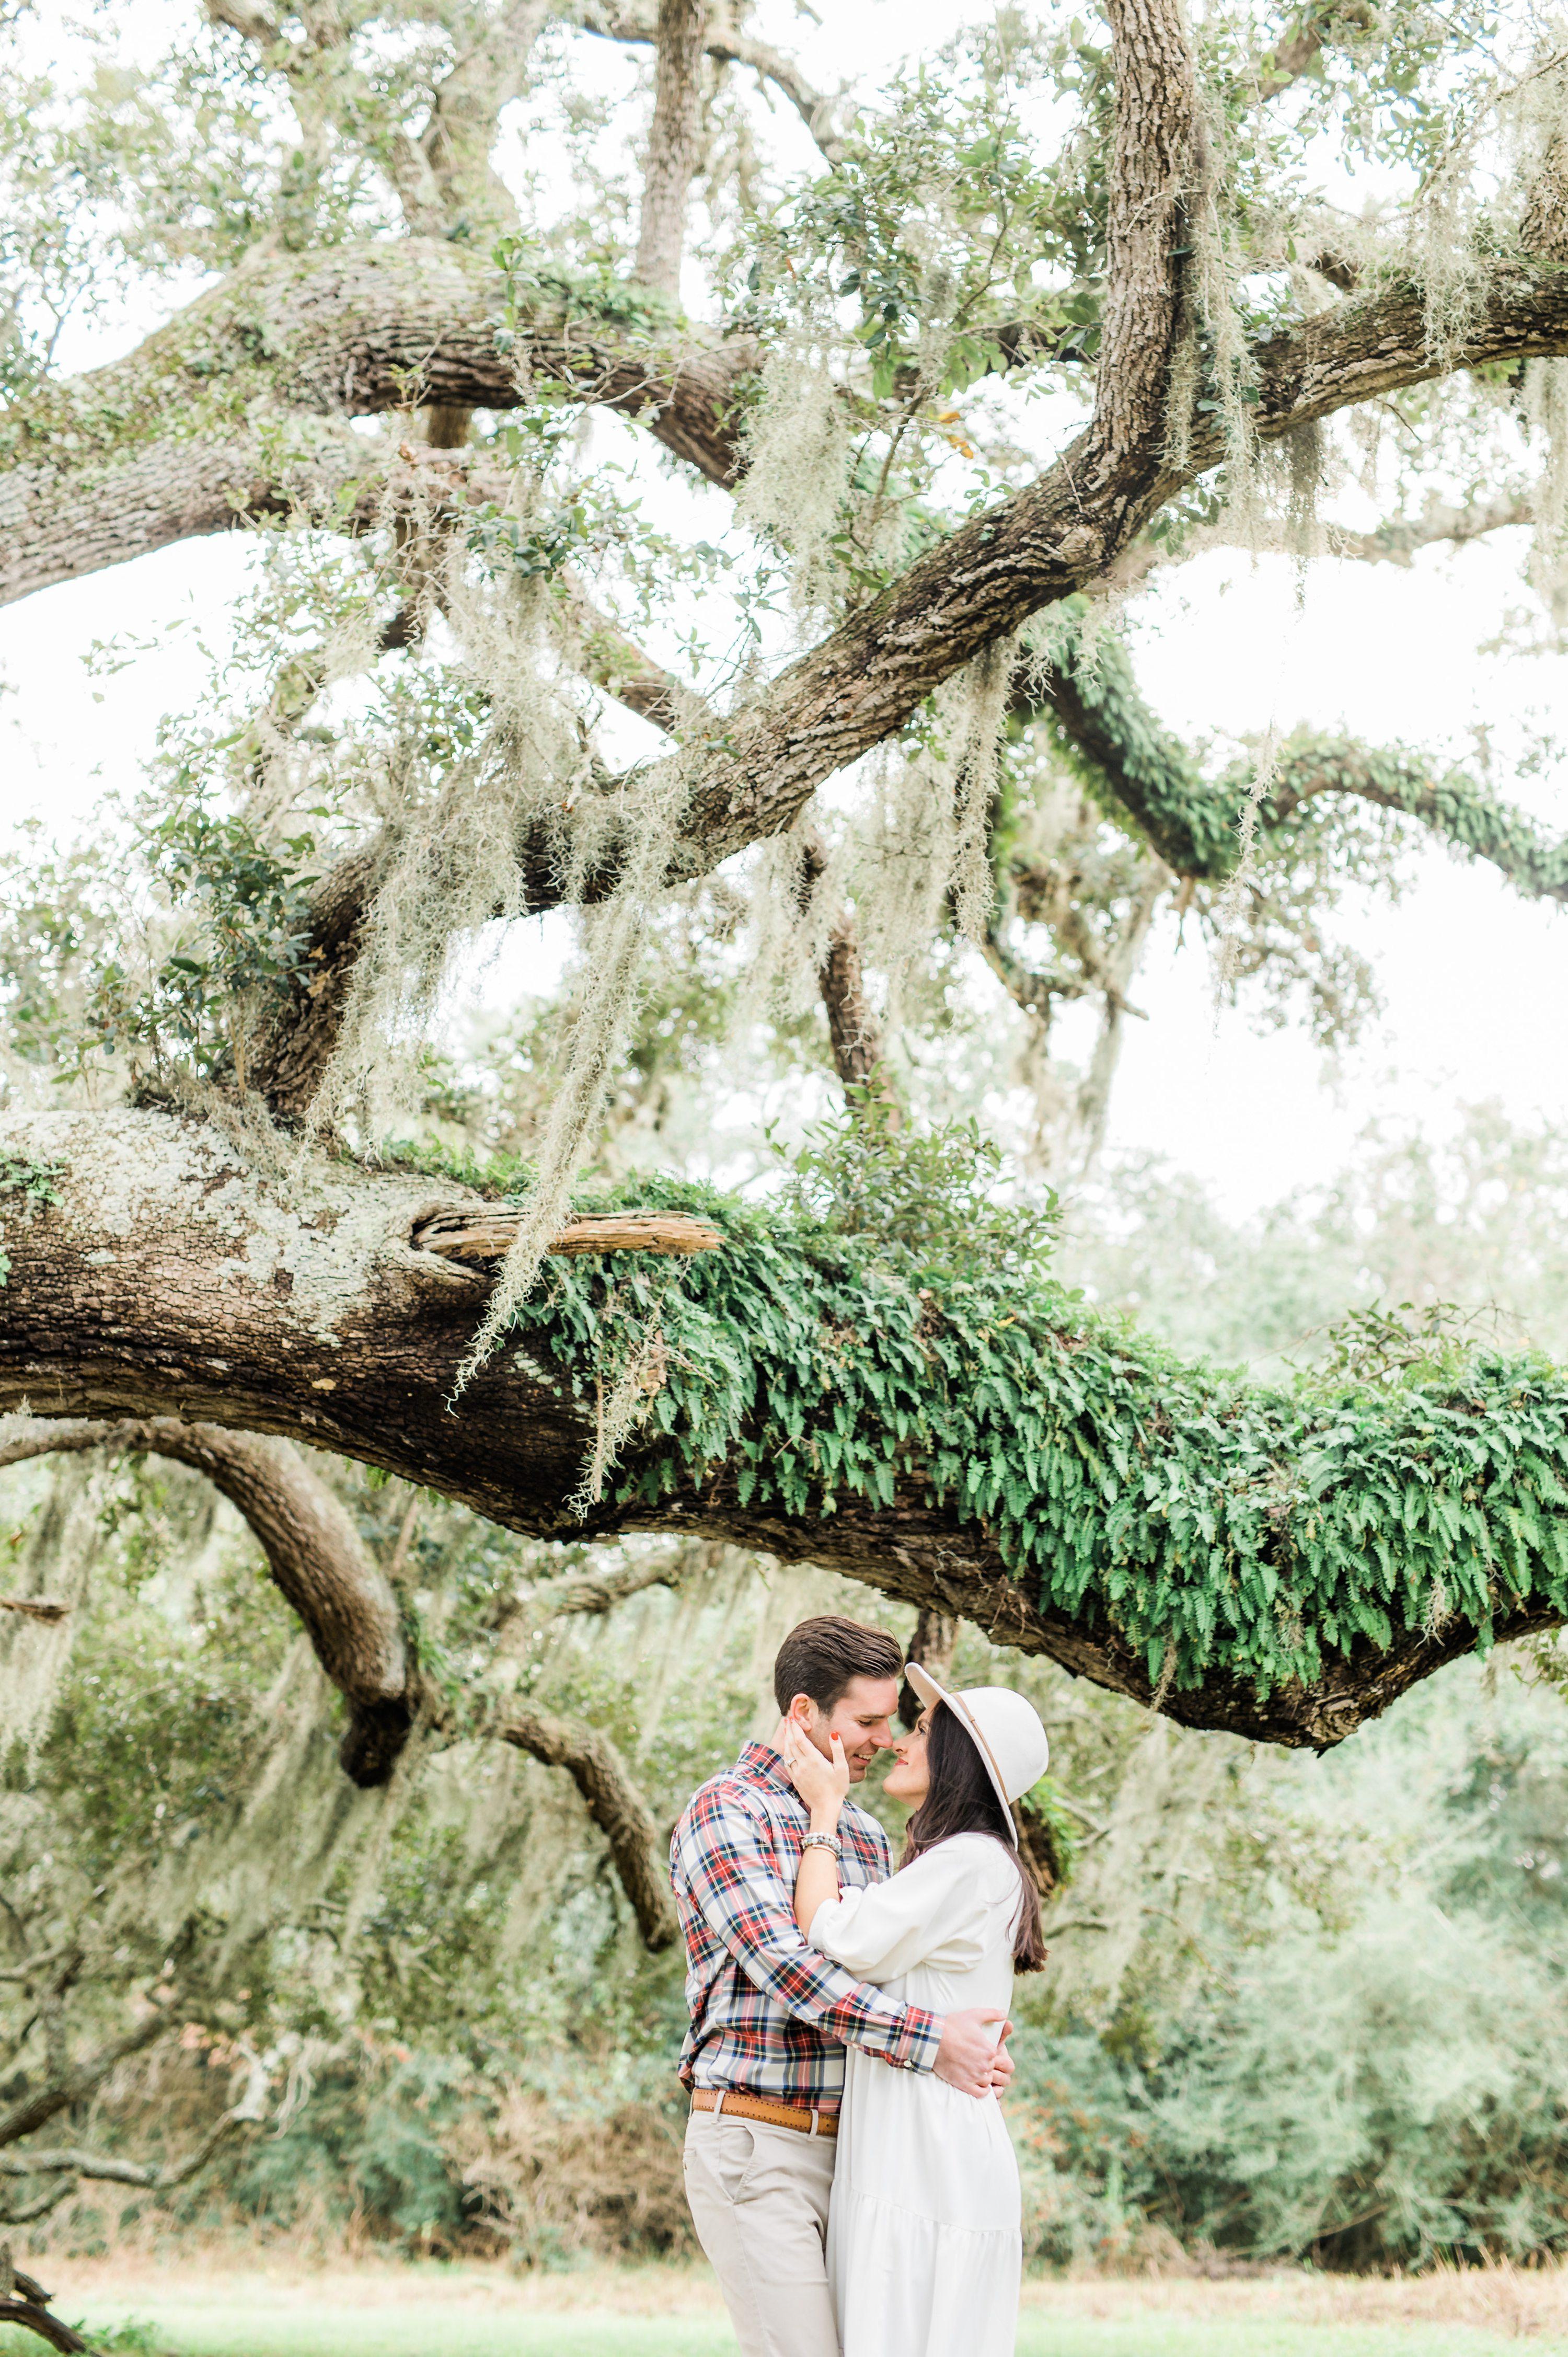 Houston Wedding,Houston Wedding Photography